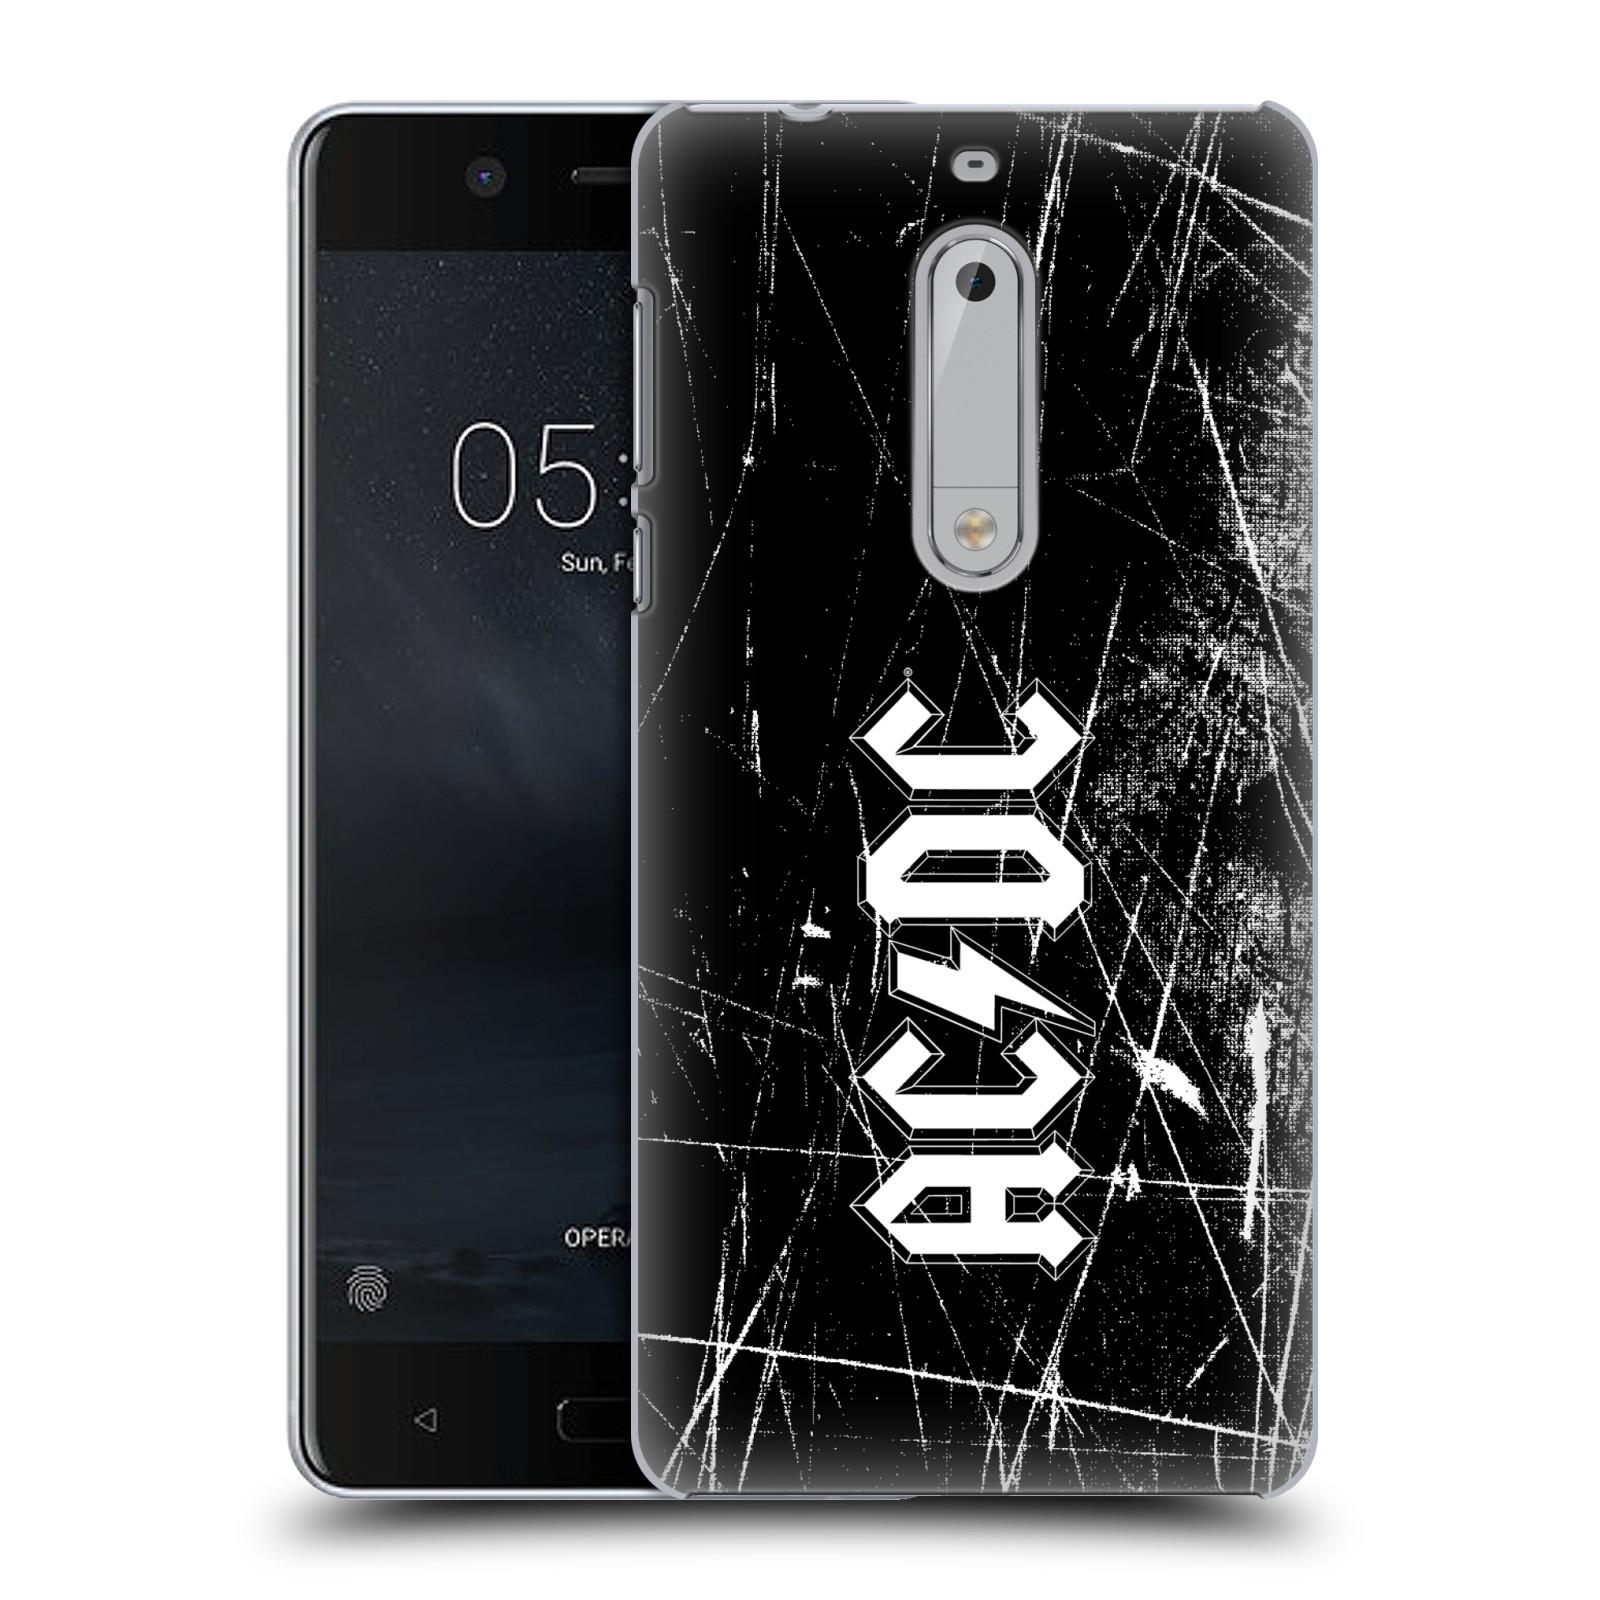 Plastové pouzdro na mobil Nokia 5 Head Case - AC/DC Černobílé logo